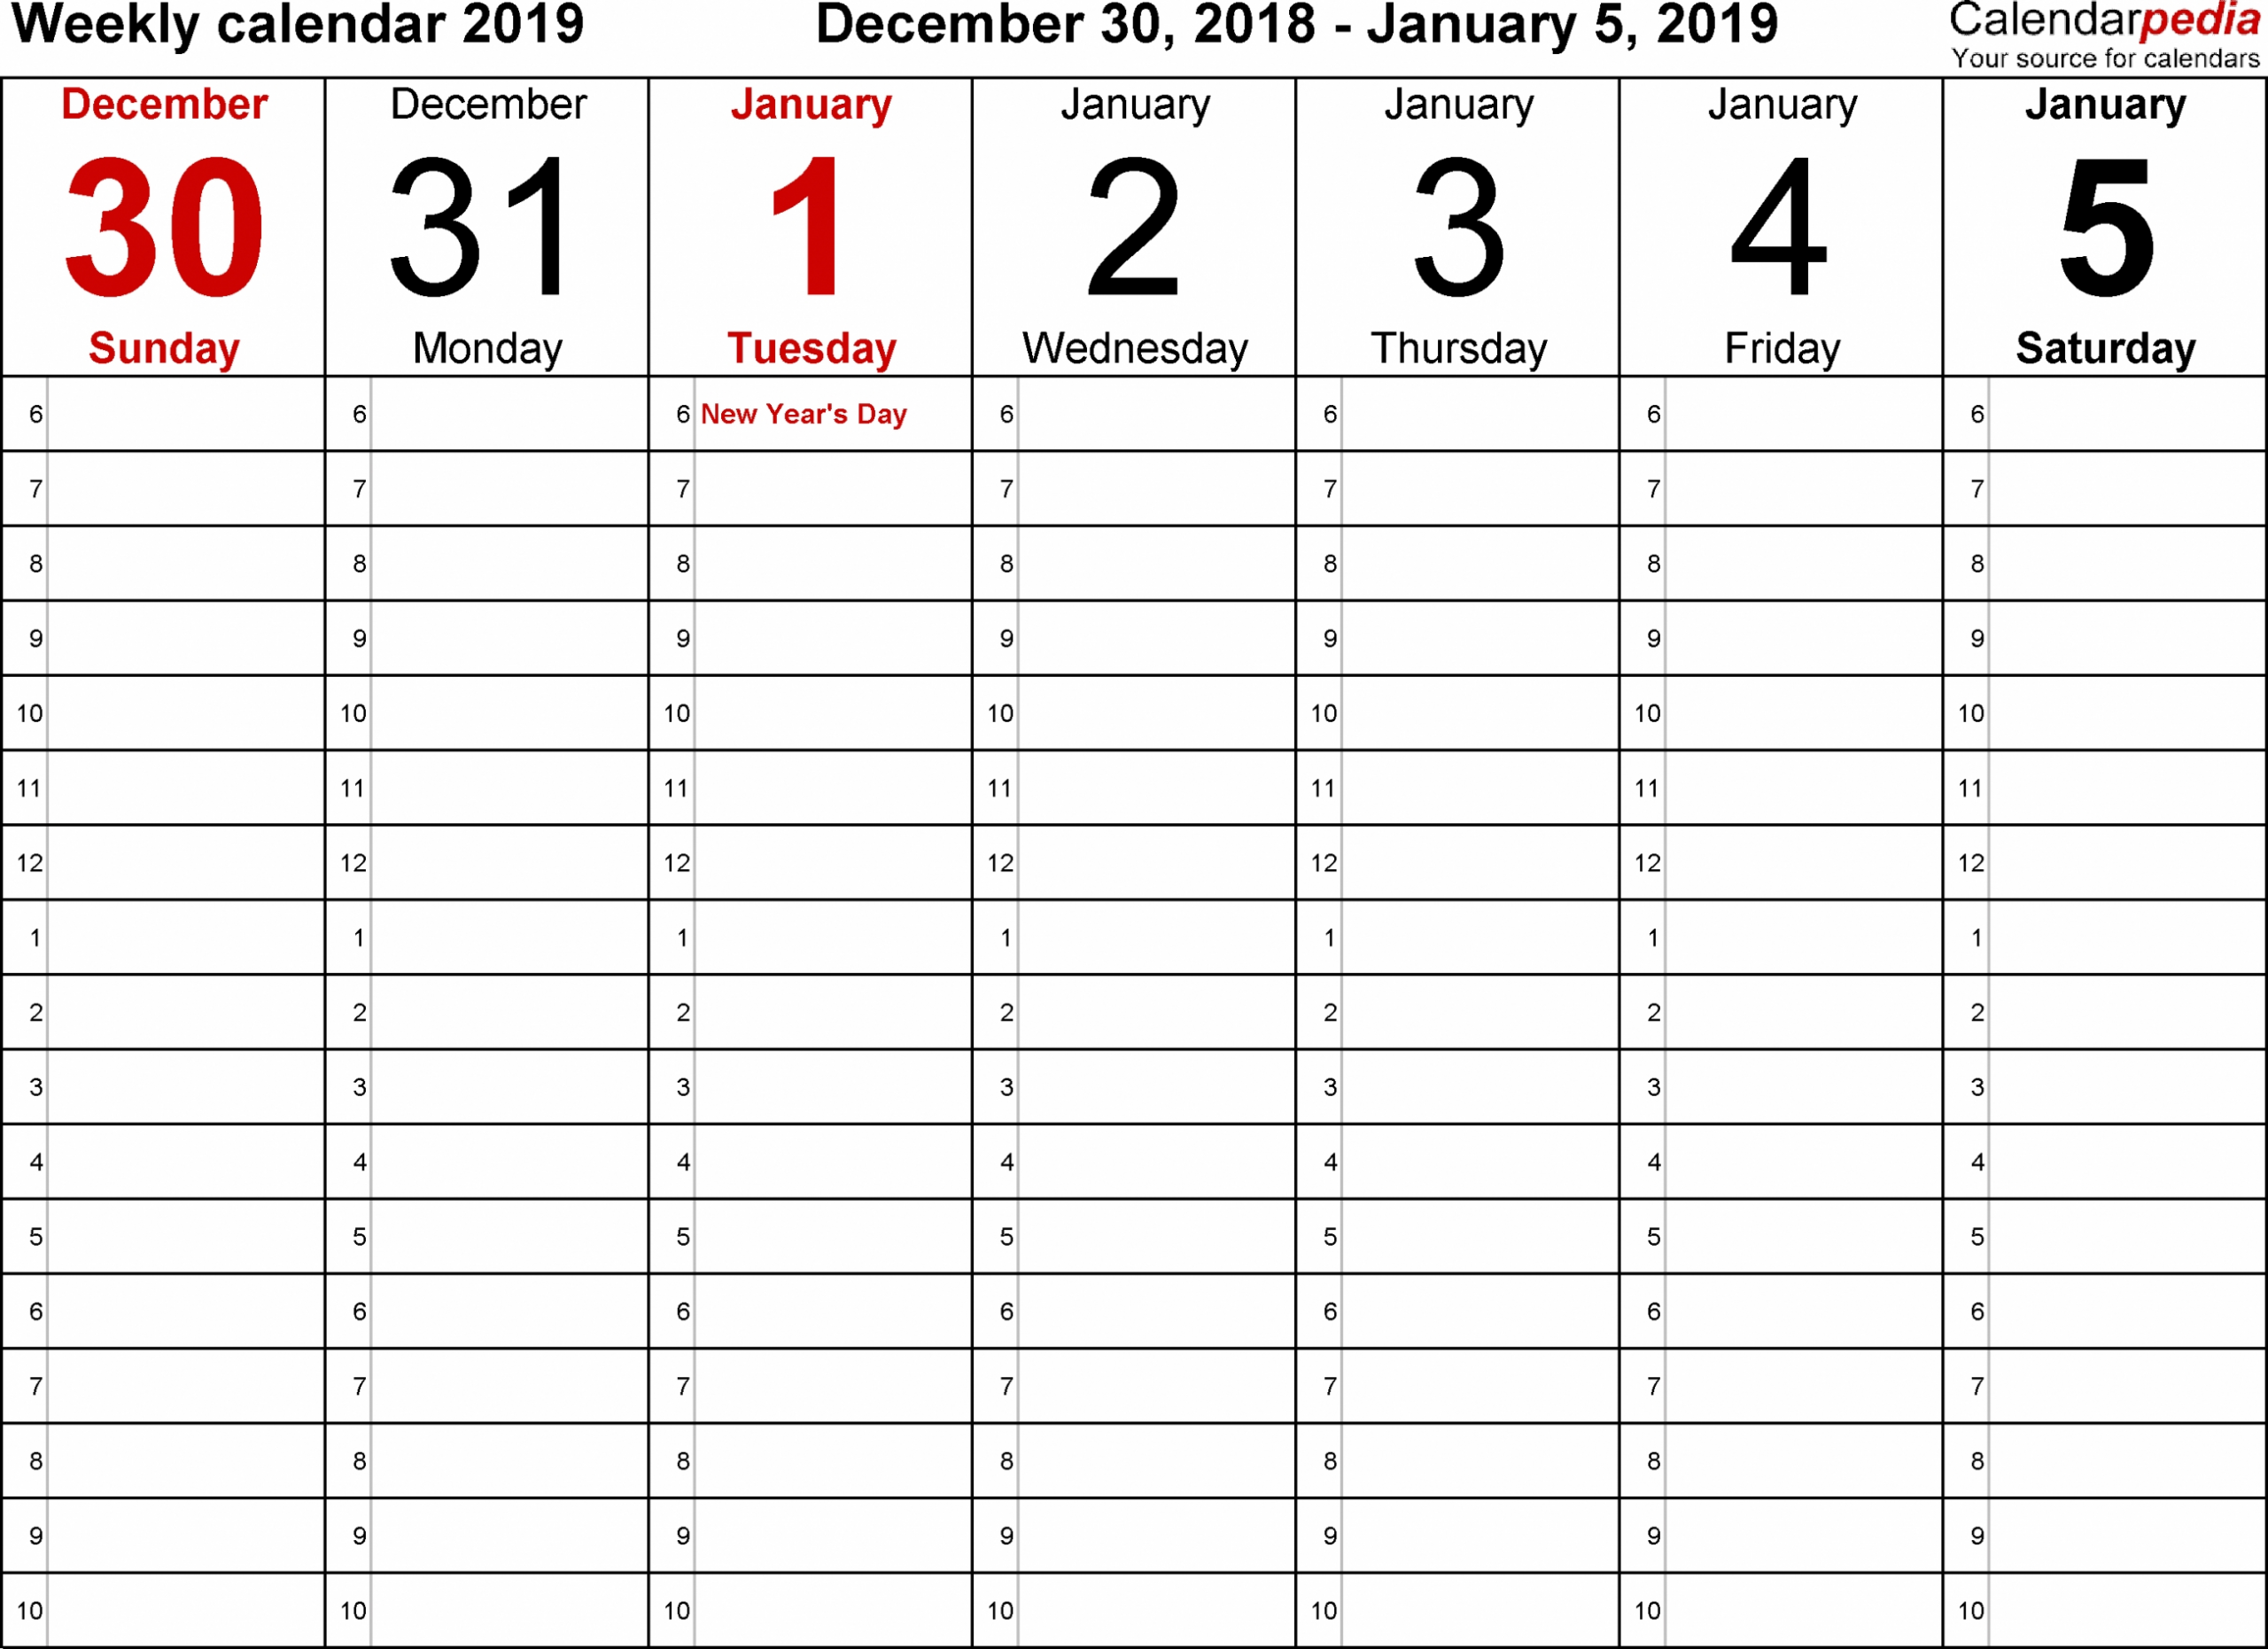 Daily Calendar 2019 Free | Daily Calendar Printable 2019